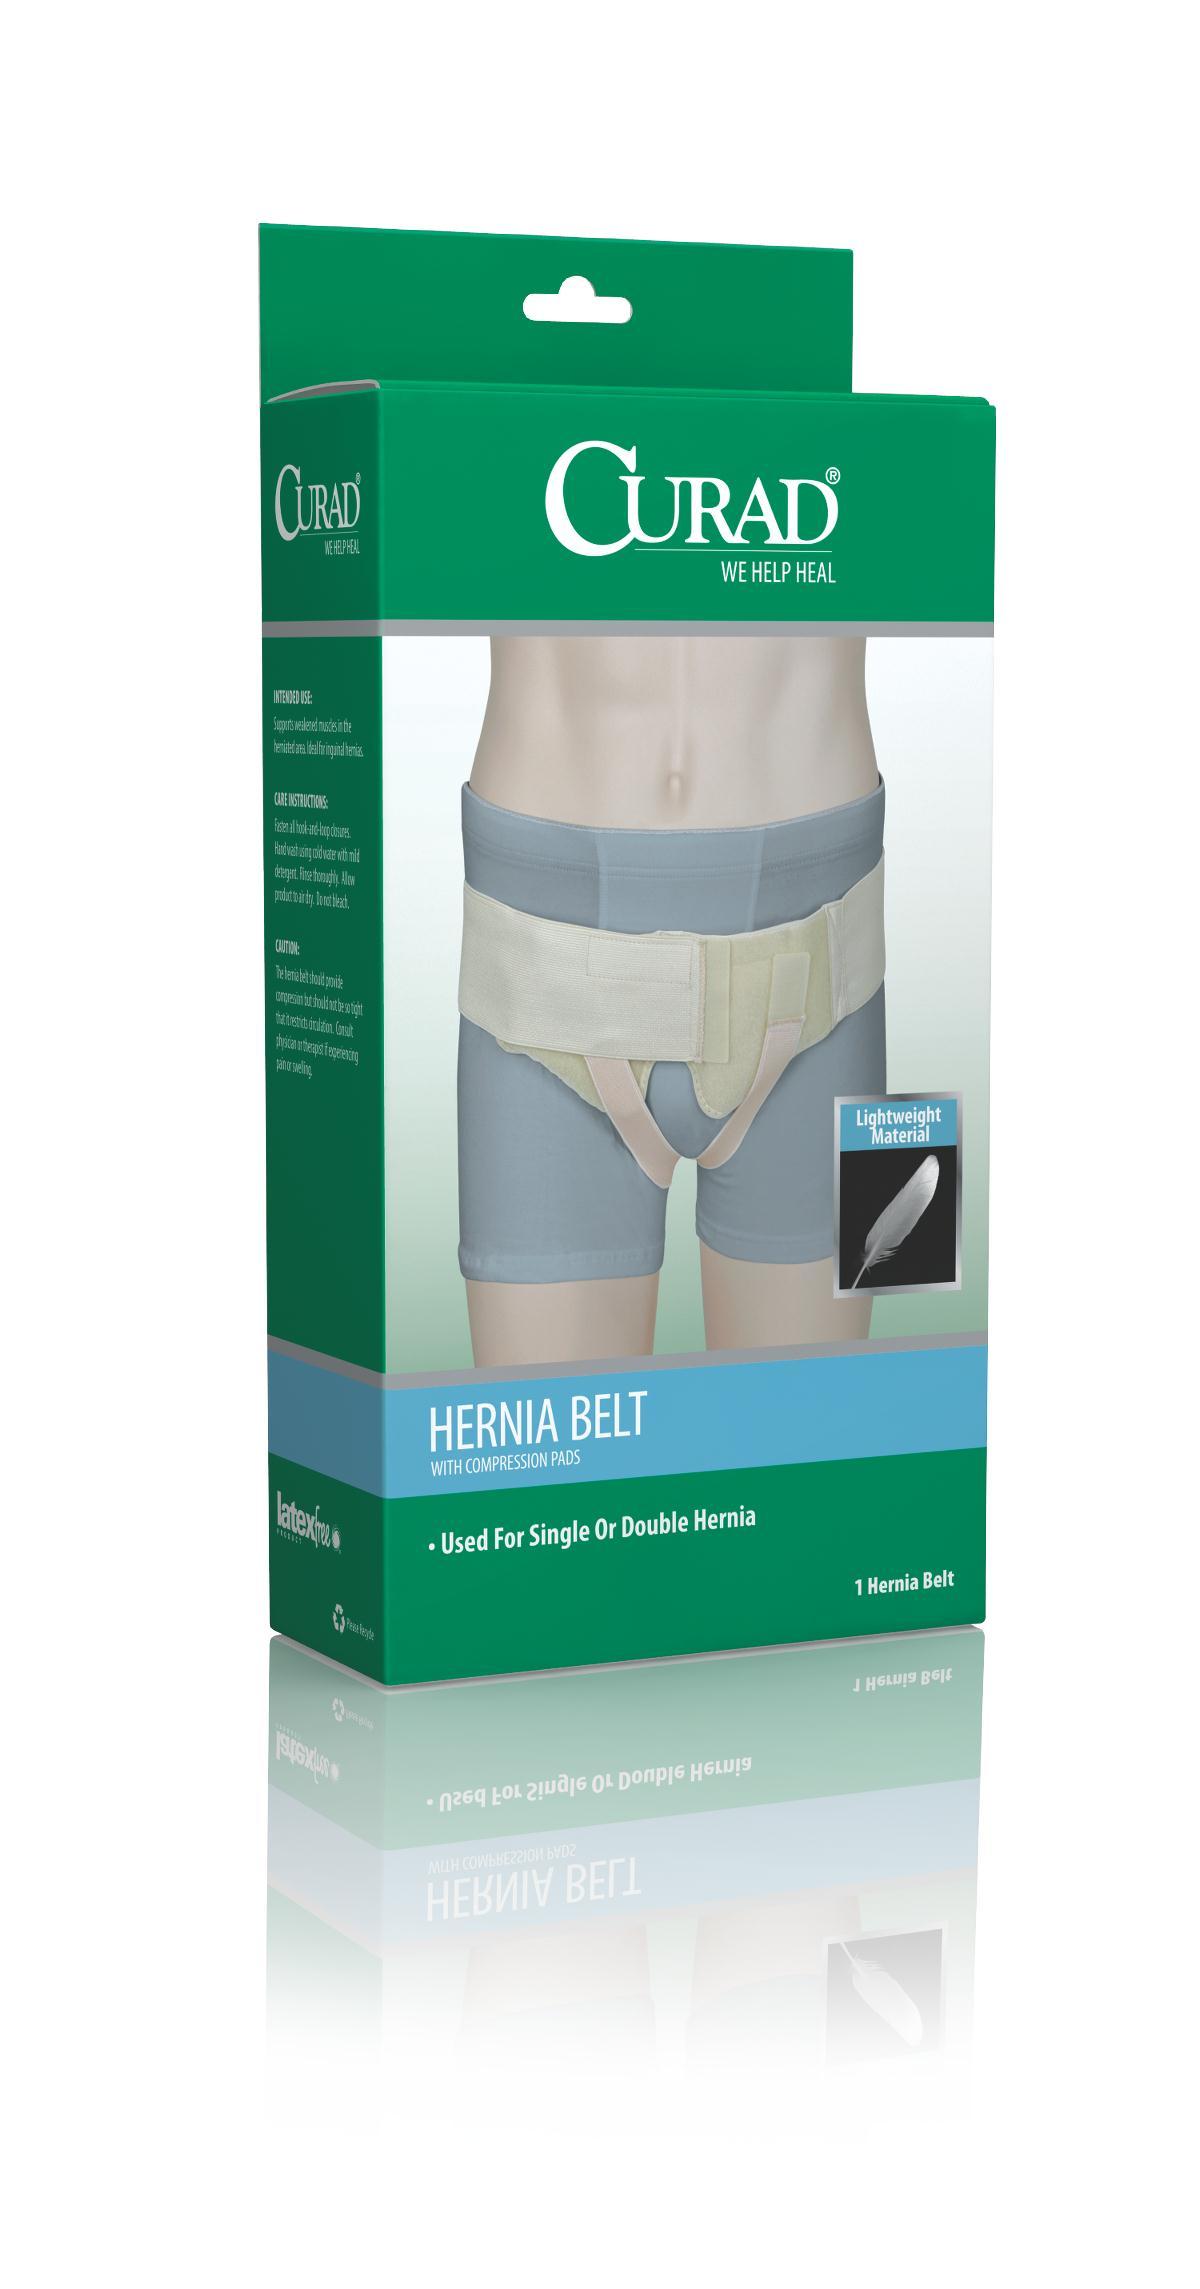 Hernia Belts Image